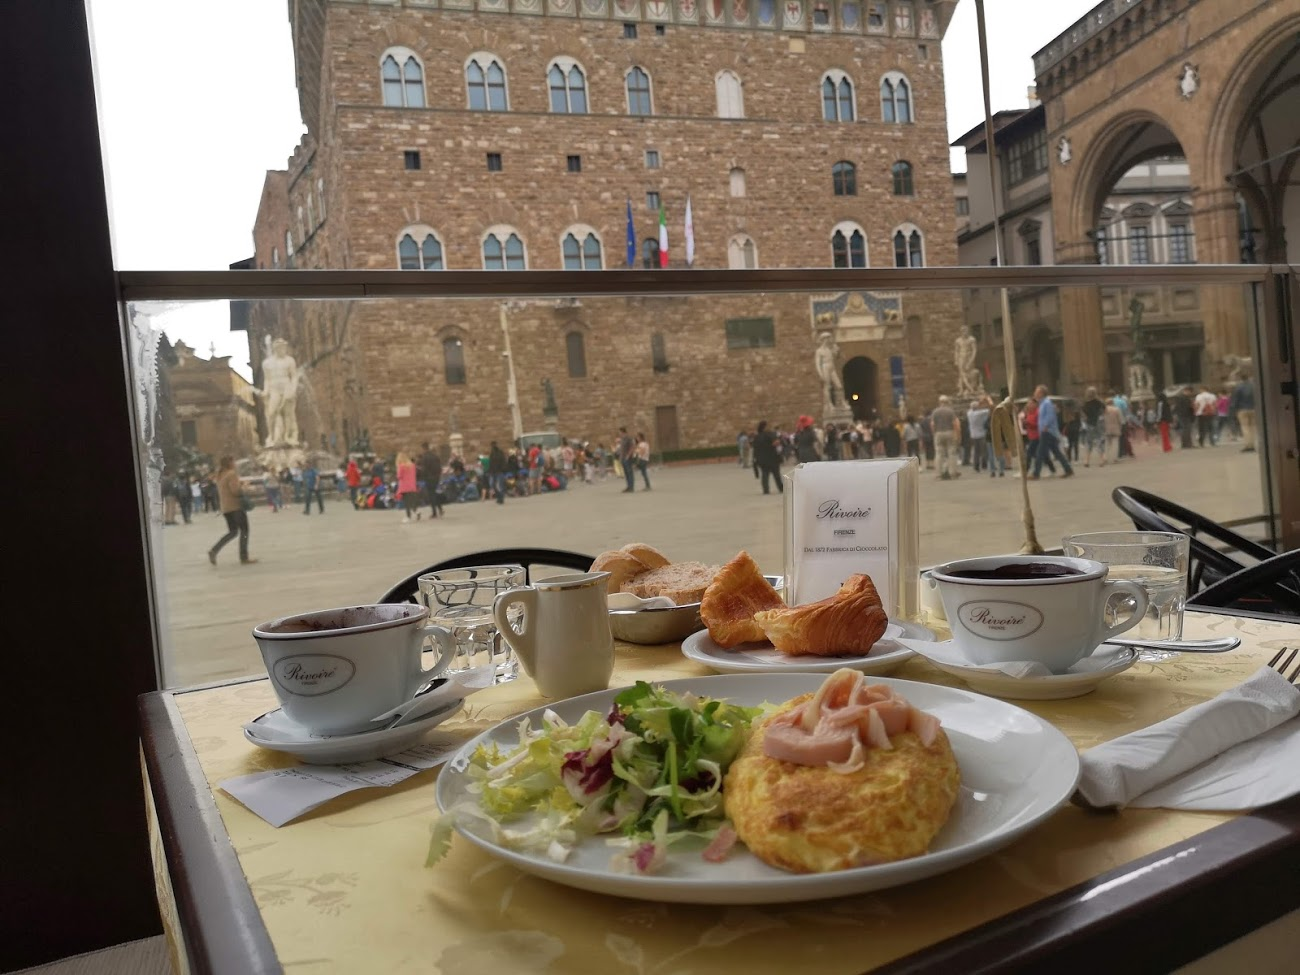 restaurante - almuerzo - florencia - cafe - plaza